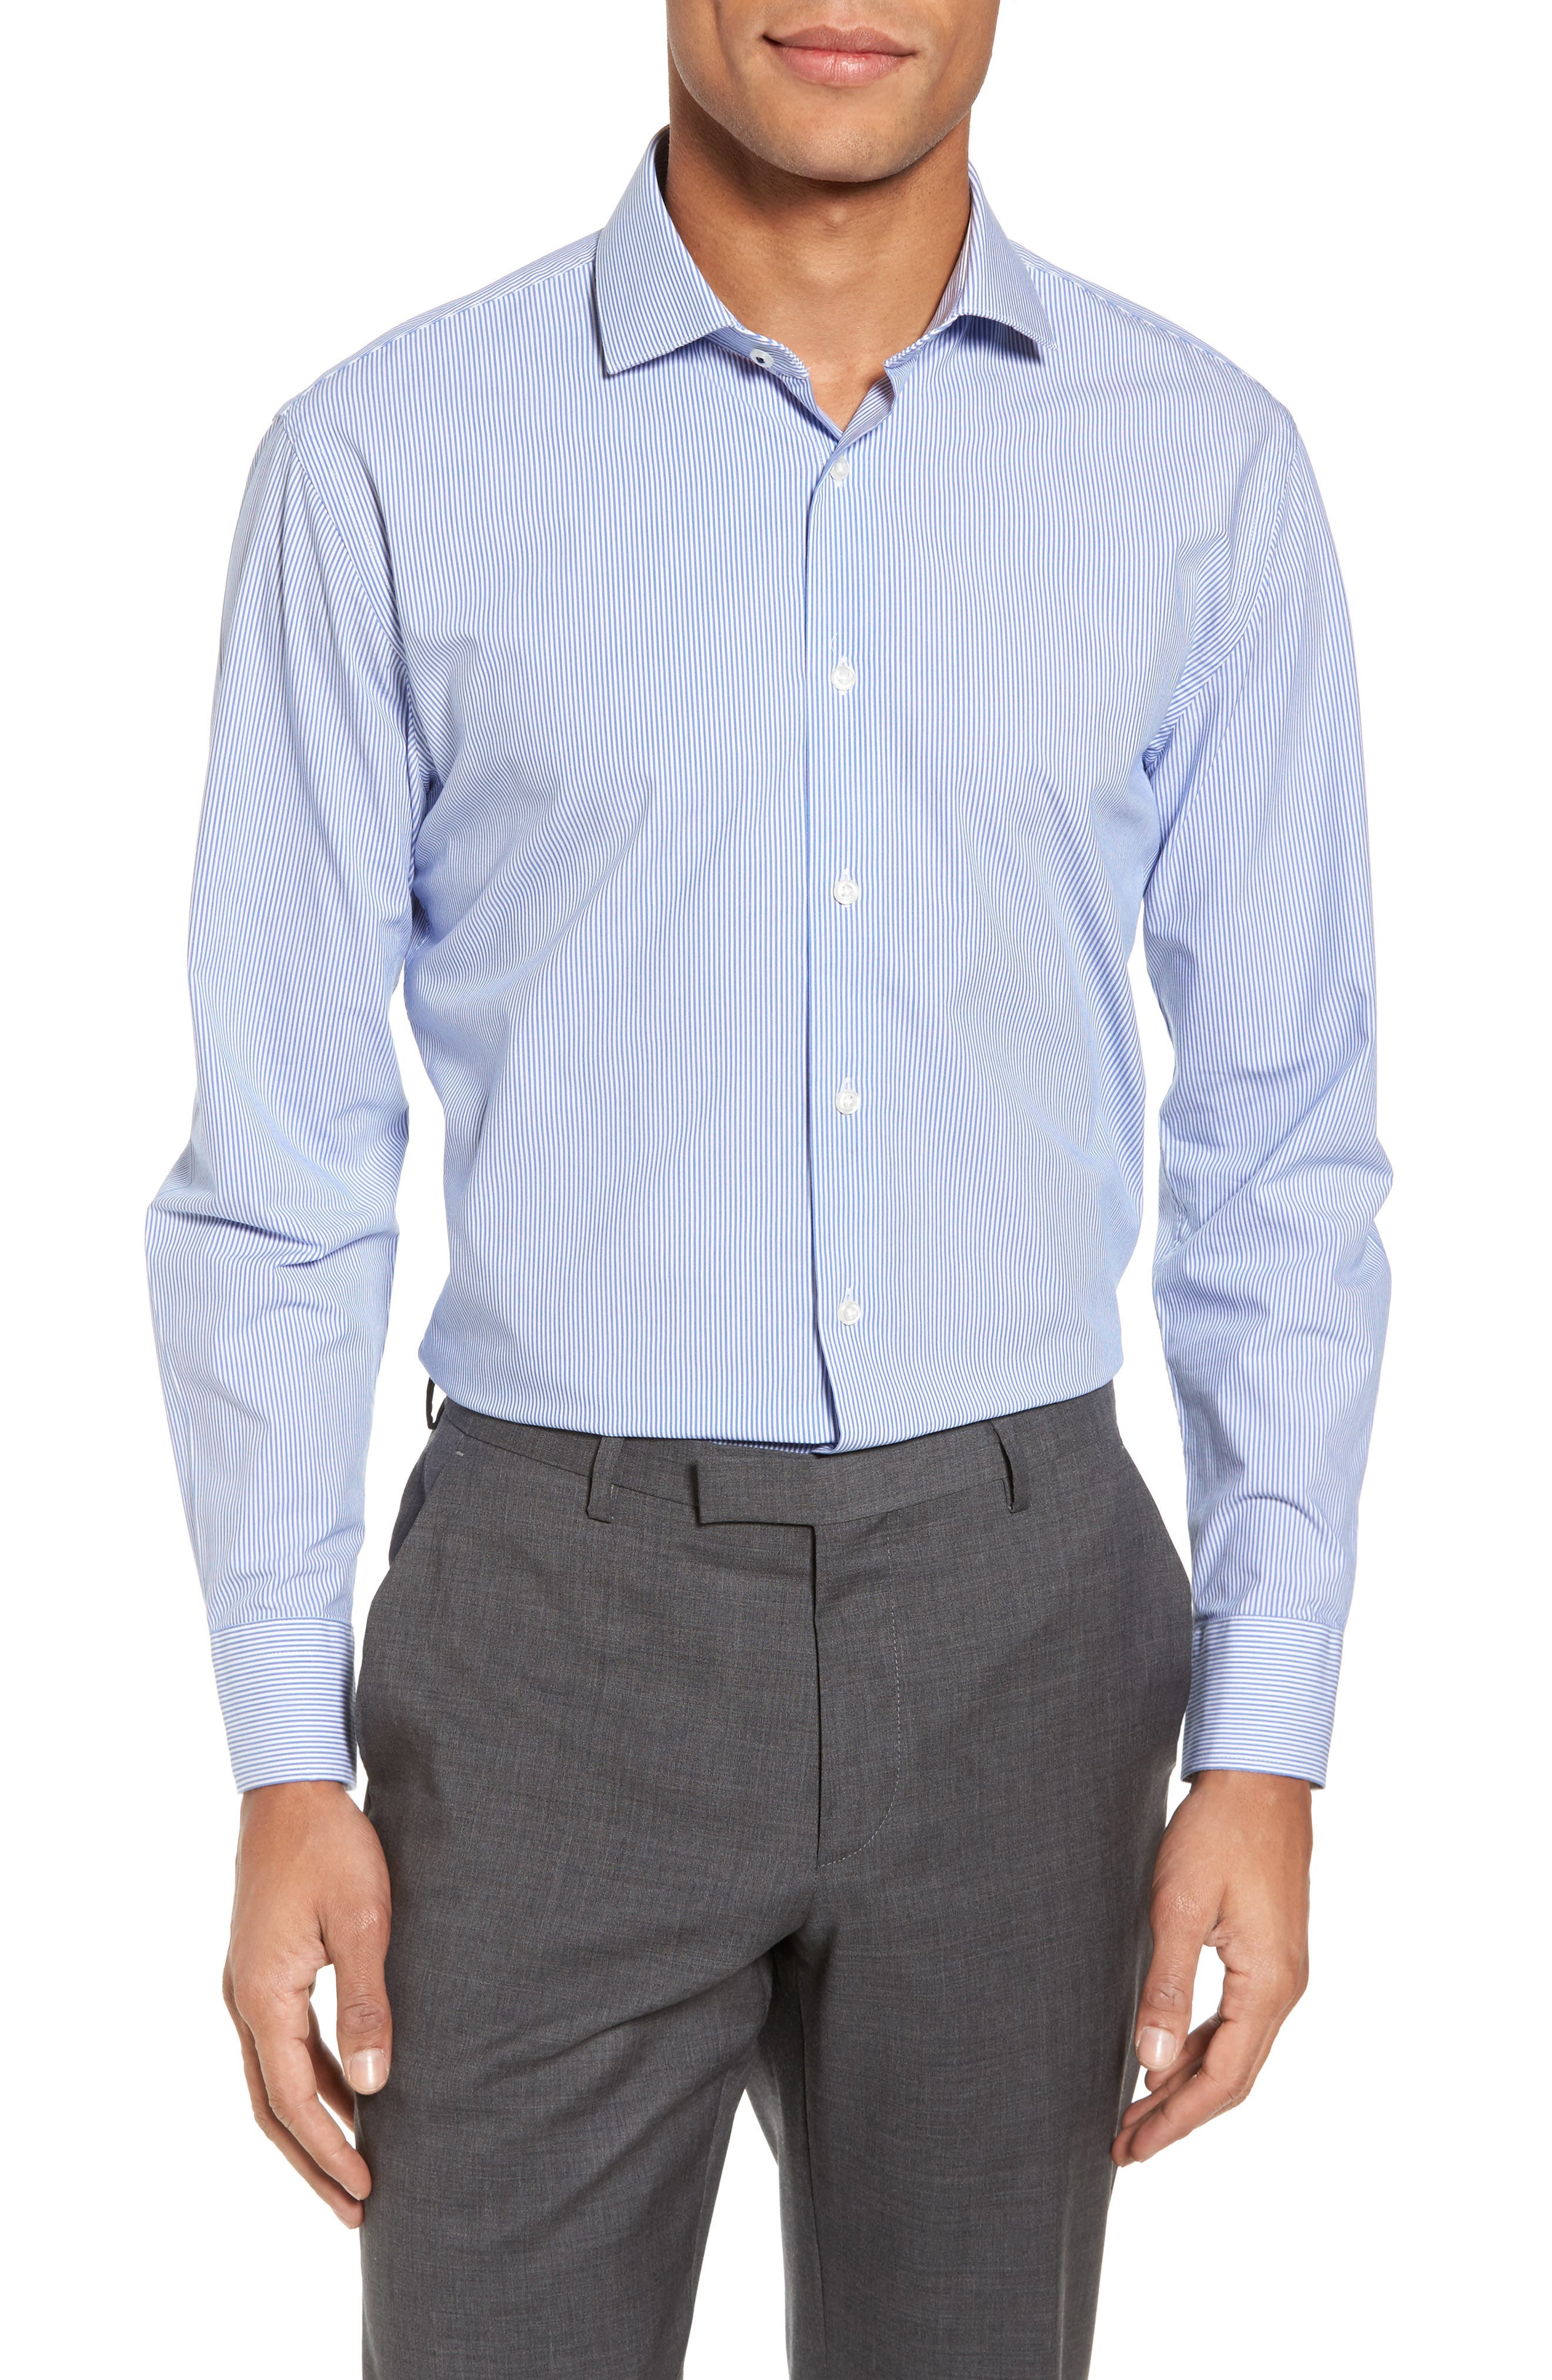 Tech-Smart Trim Fit Stretch Stripe Dress Shirt,                         Main,                         color, 420